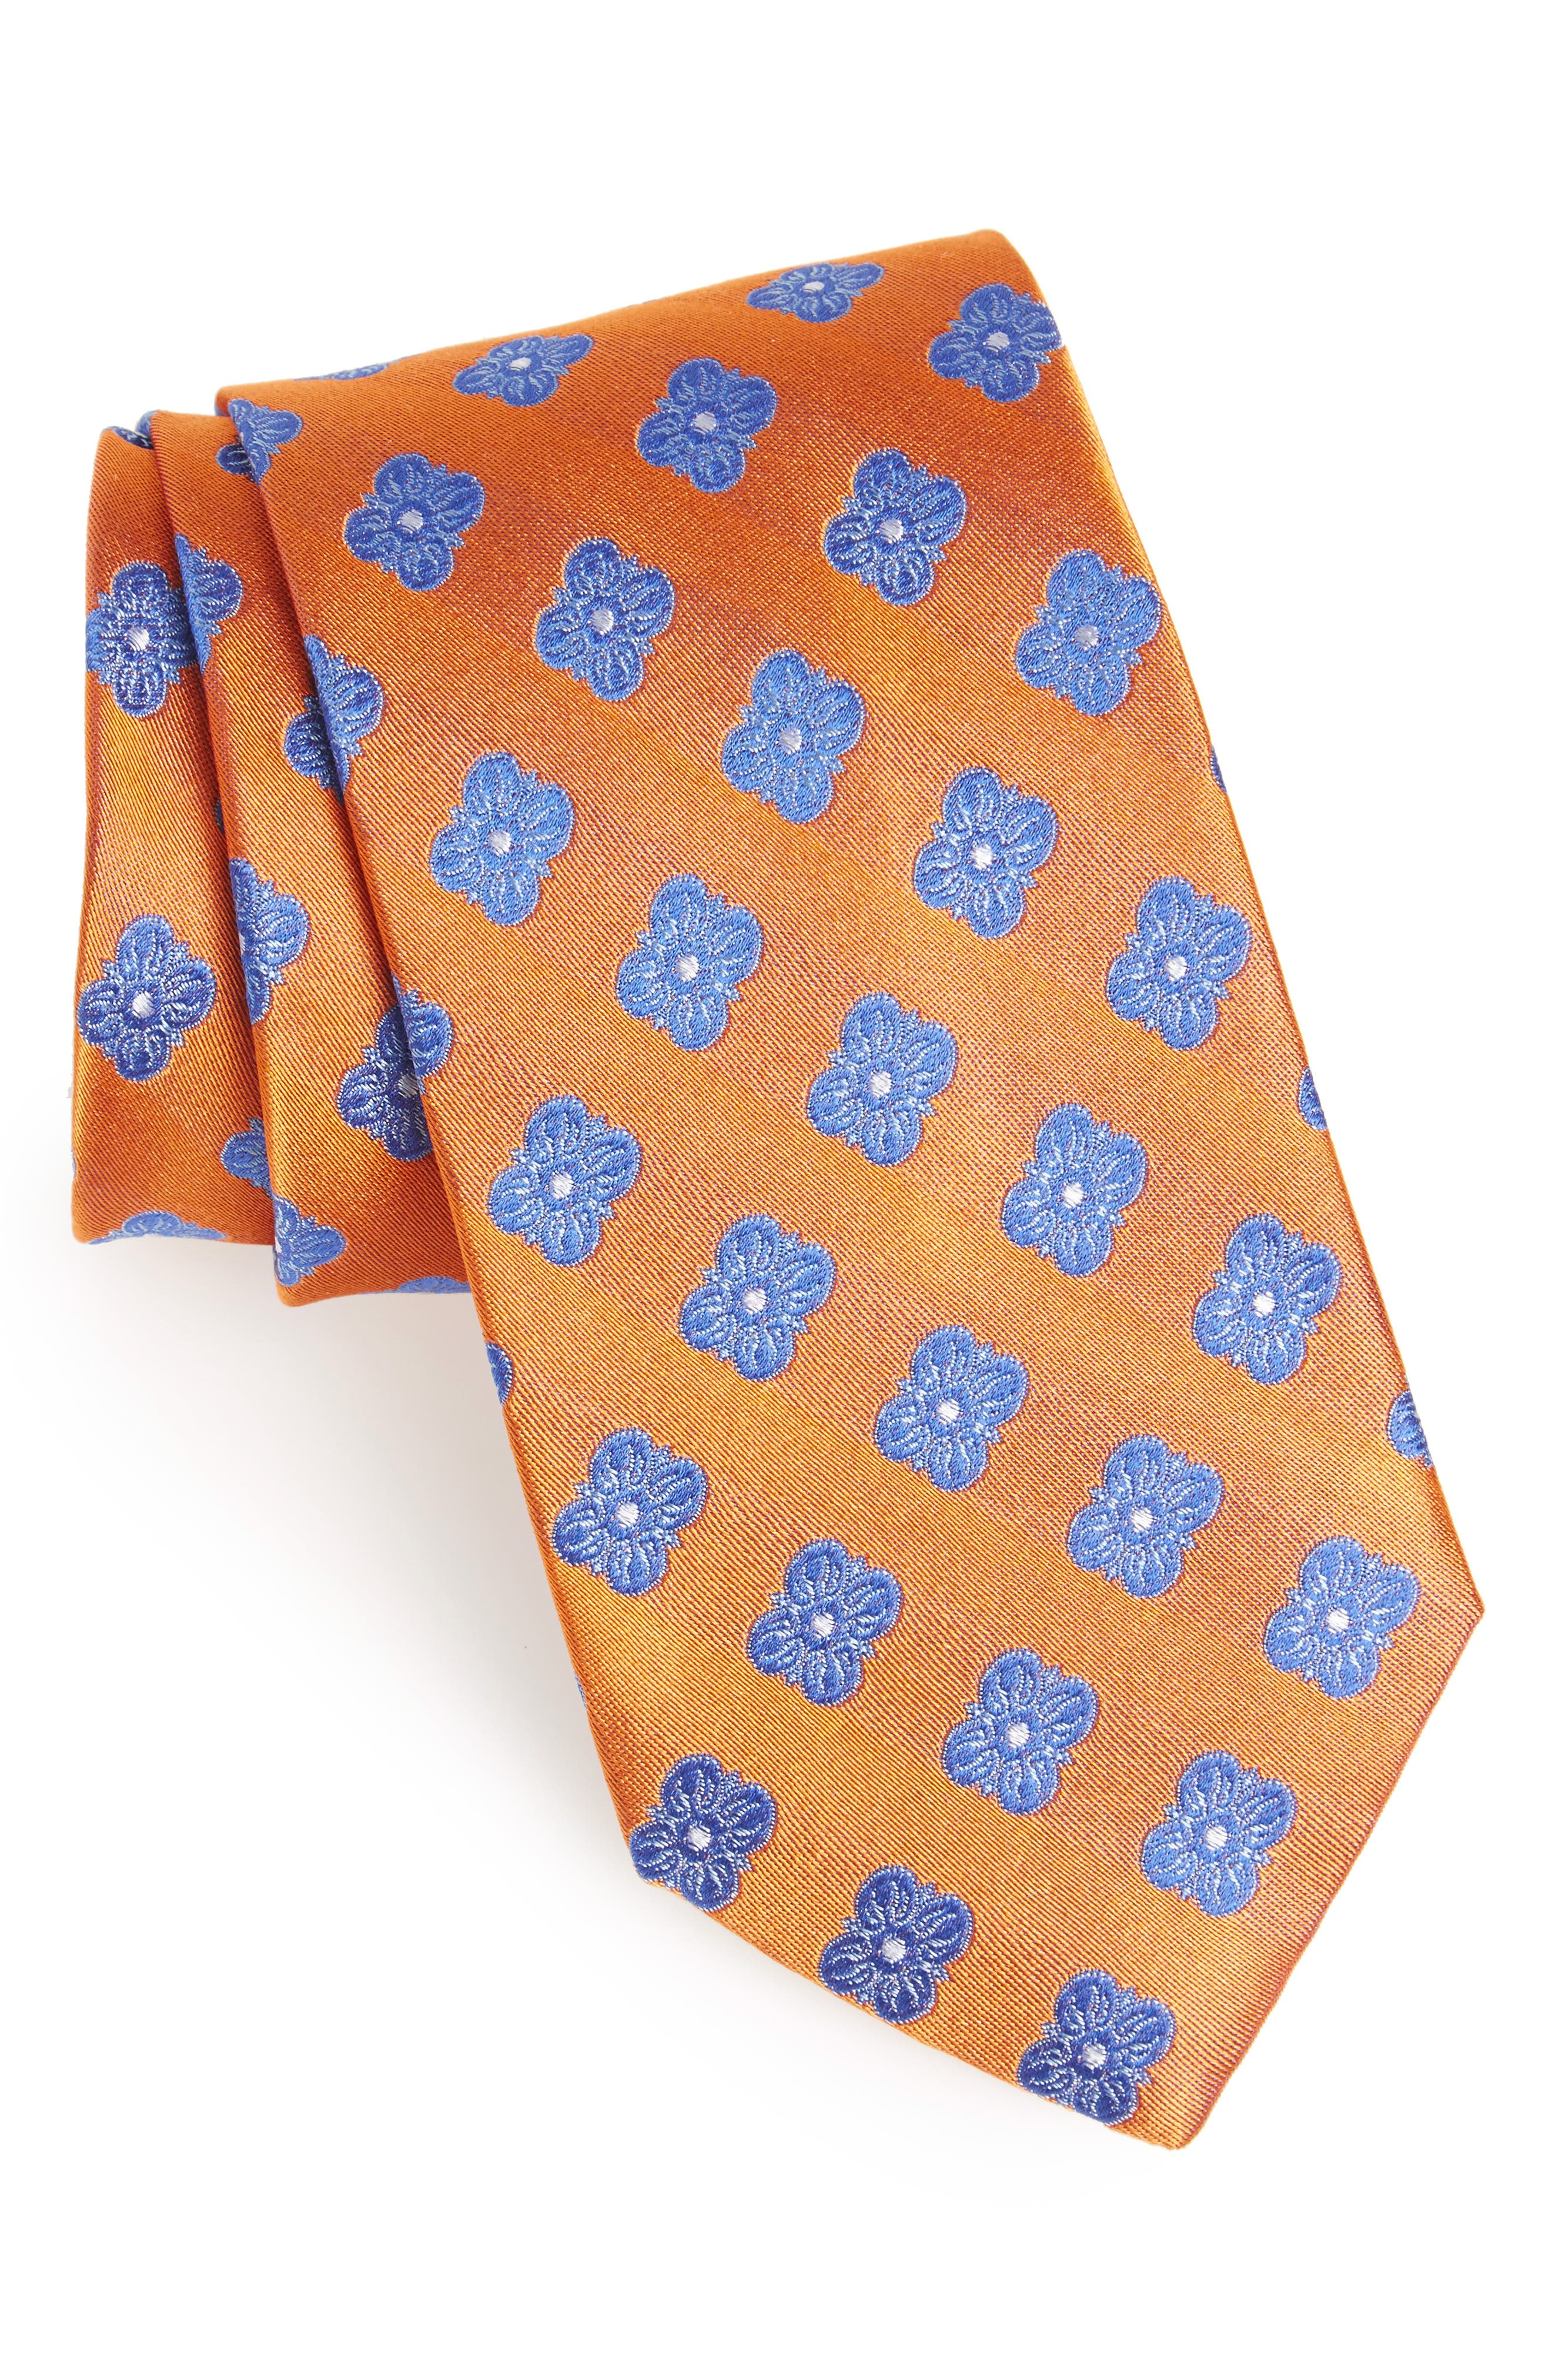 Main Image - Nordstrom Men's Shop Cameron Floral Medallion Silk Tie